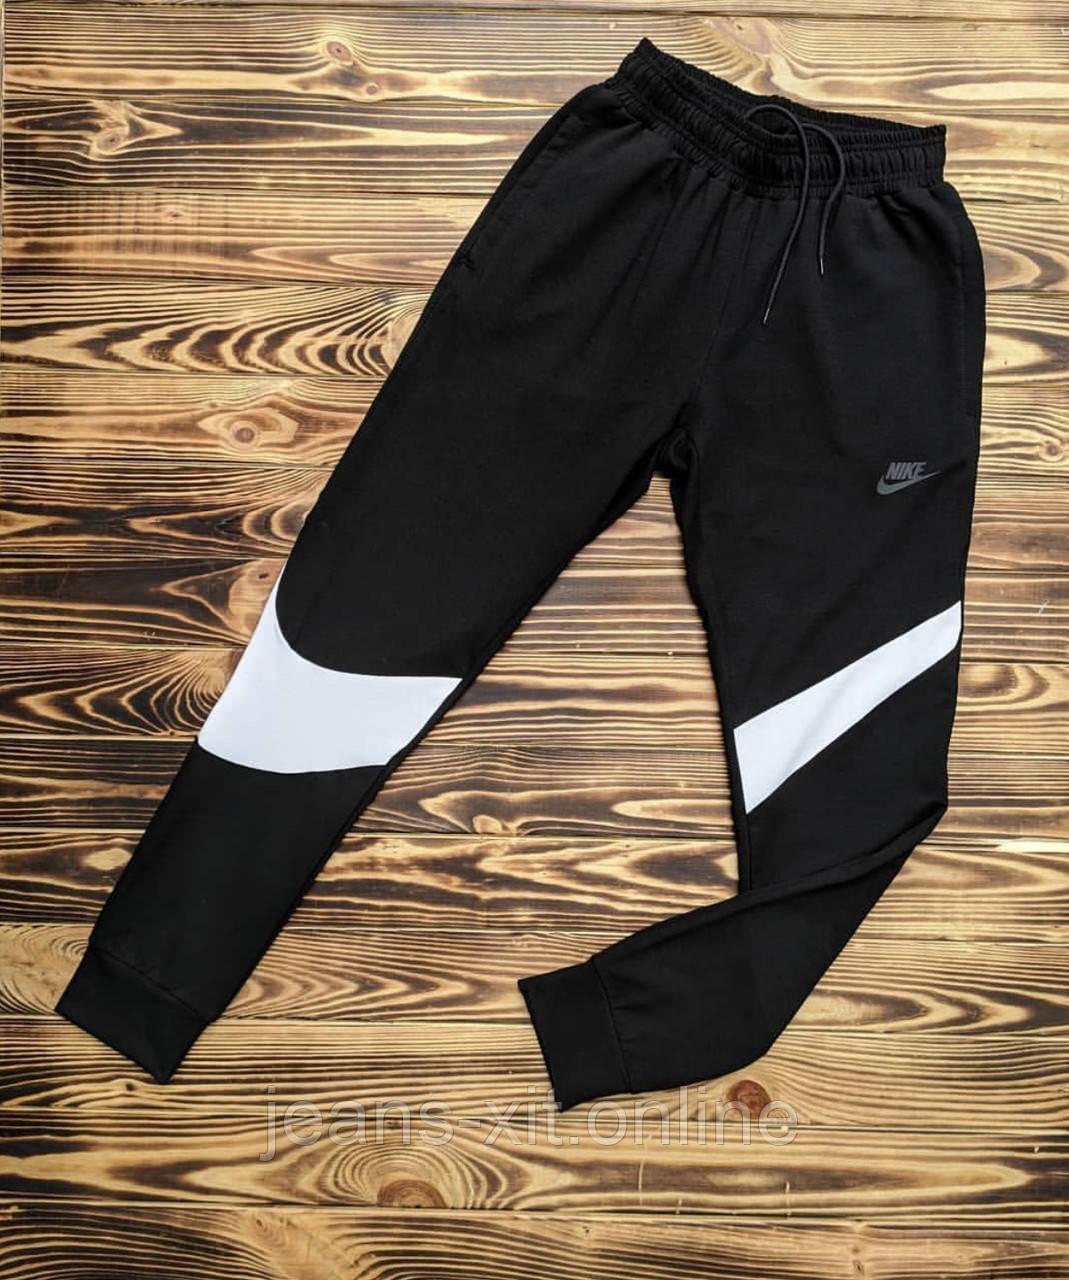 Штани Чол. L(р) чорний 103-1-20 Nike Туреччина Весна-C